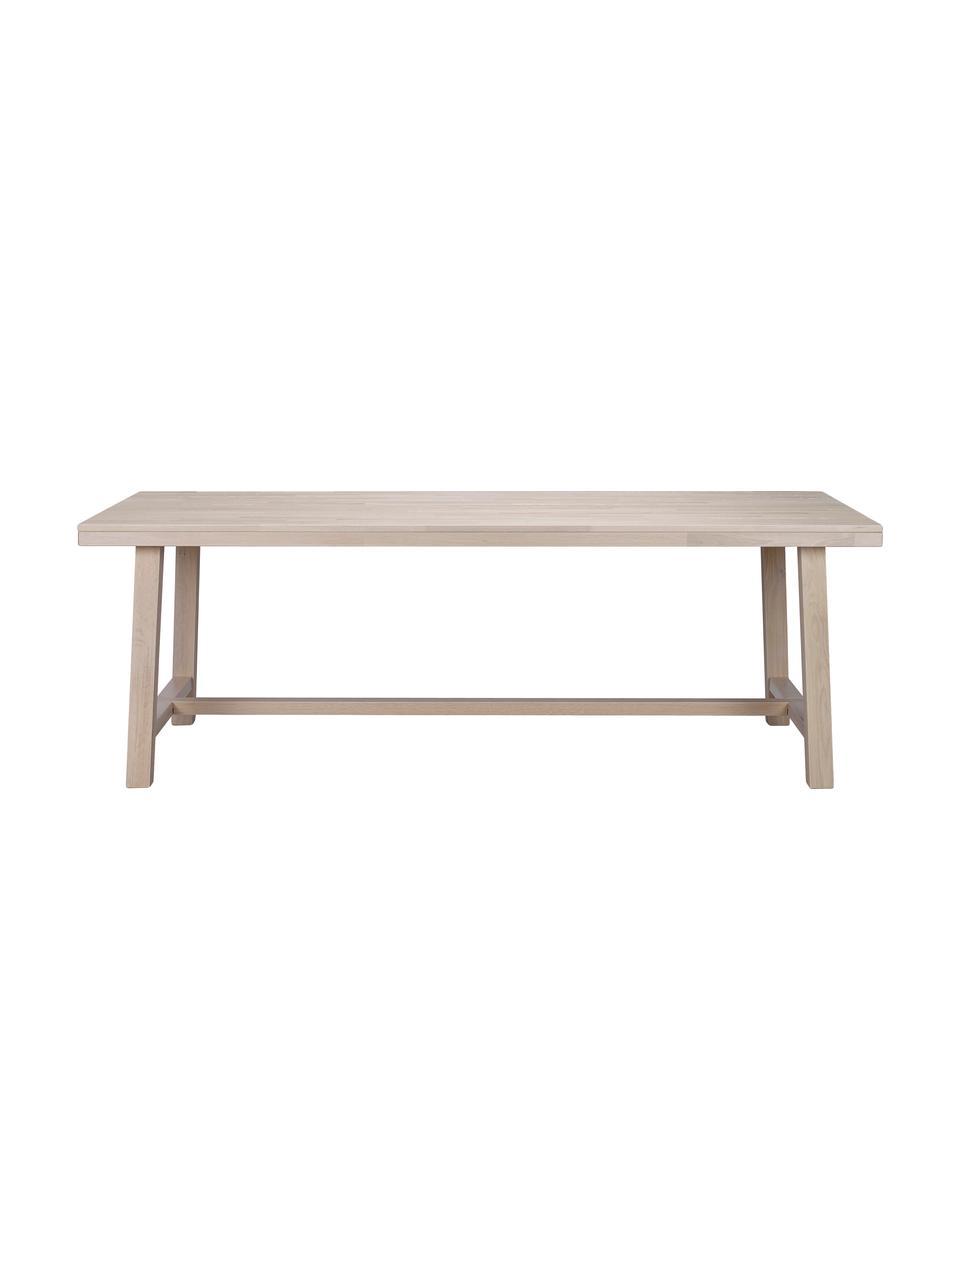 Grande table en bois massif Brooklyn, 220 x 95 cm, Chêne, blanc délavé